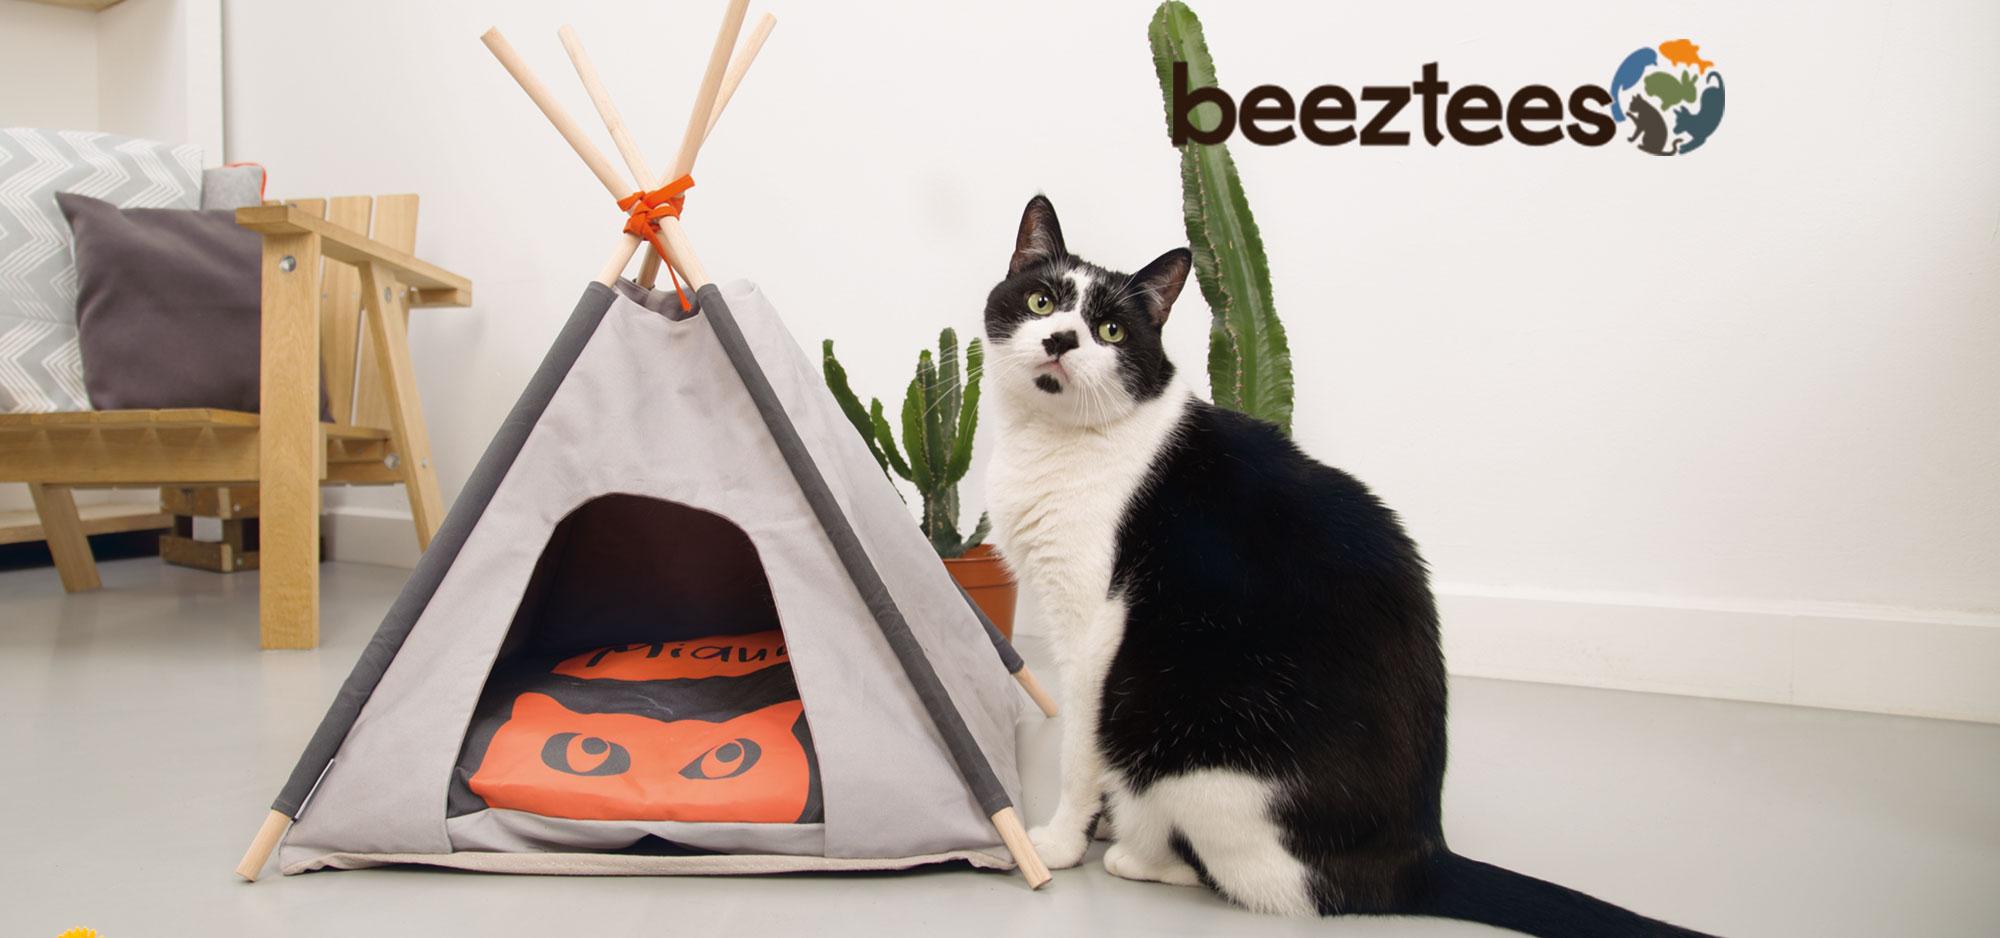 Beeztees Katzenzubehör Fresh, Bild 6